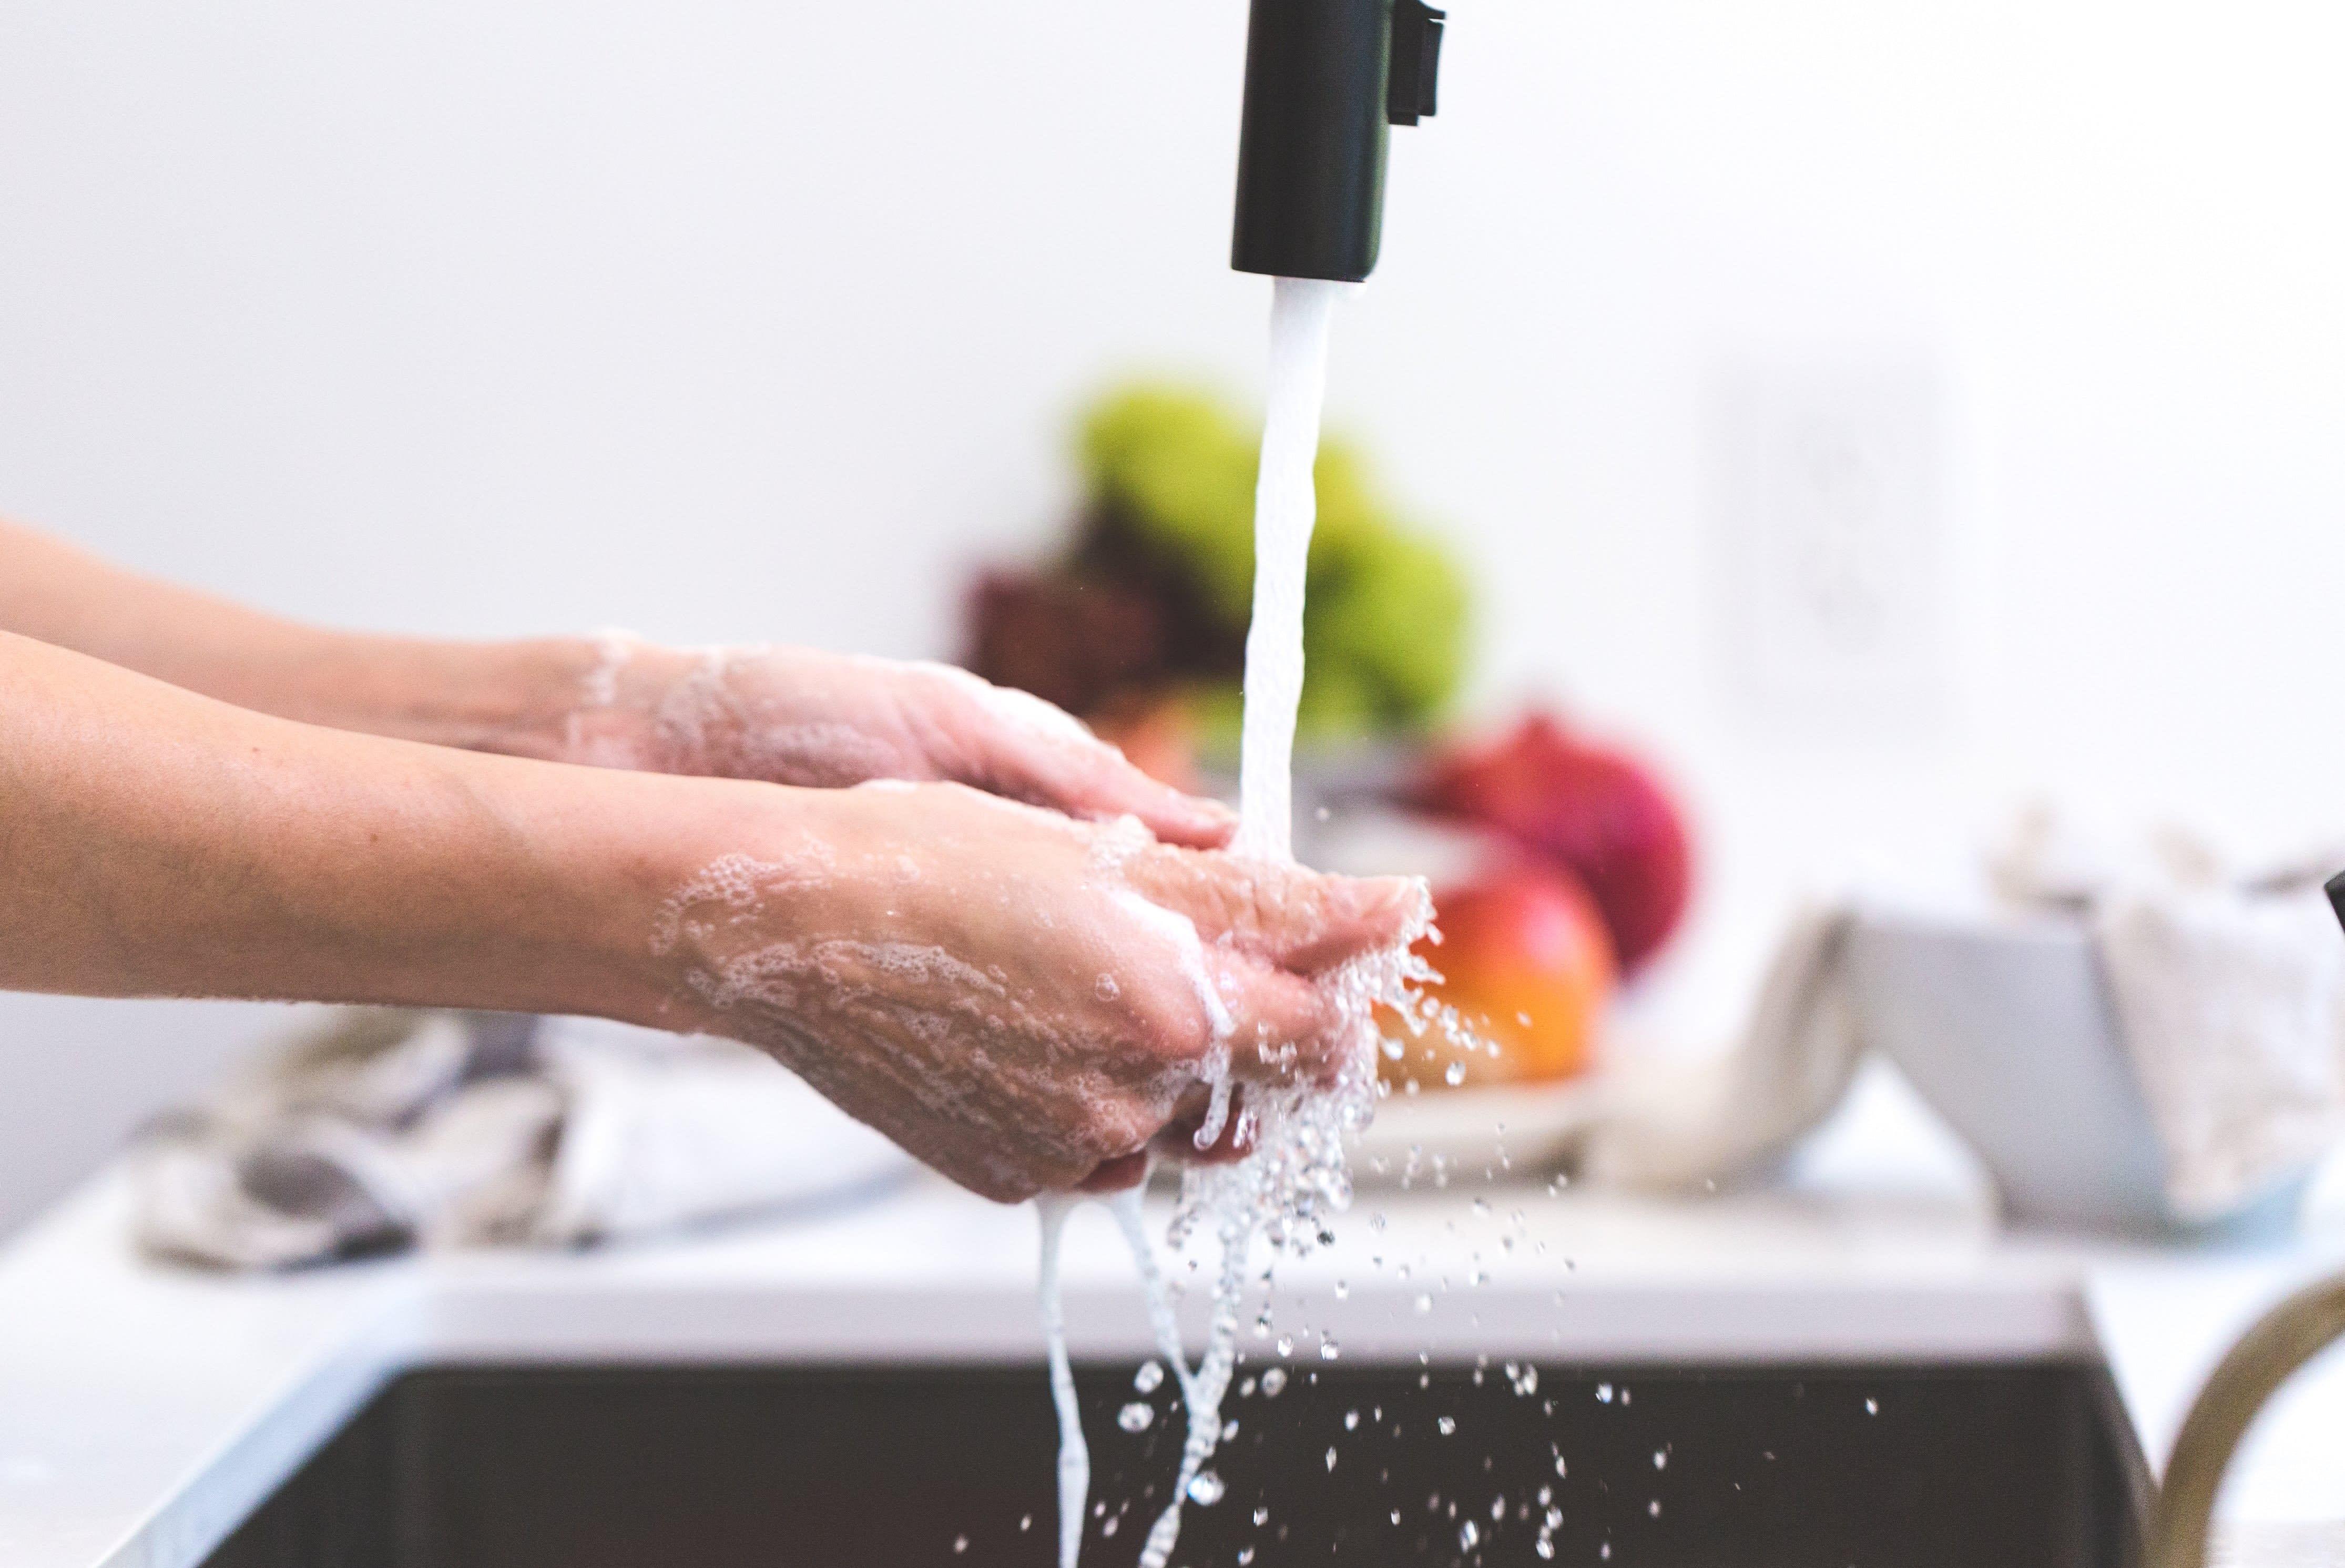 cleaning-hands-handwashing-545013.jpg